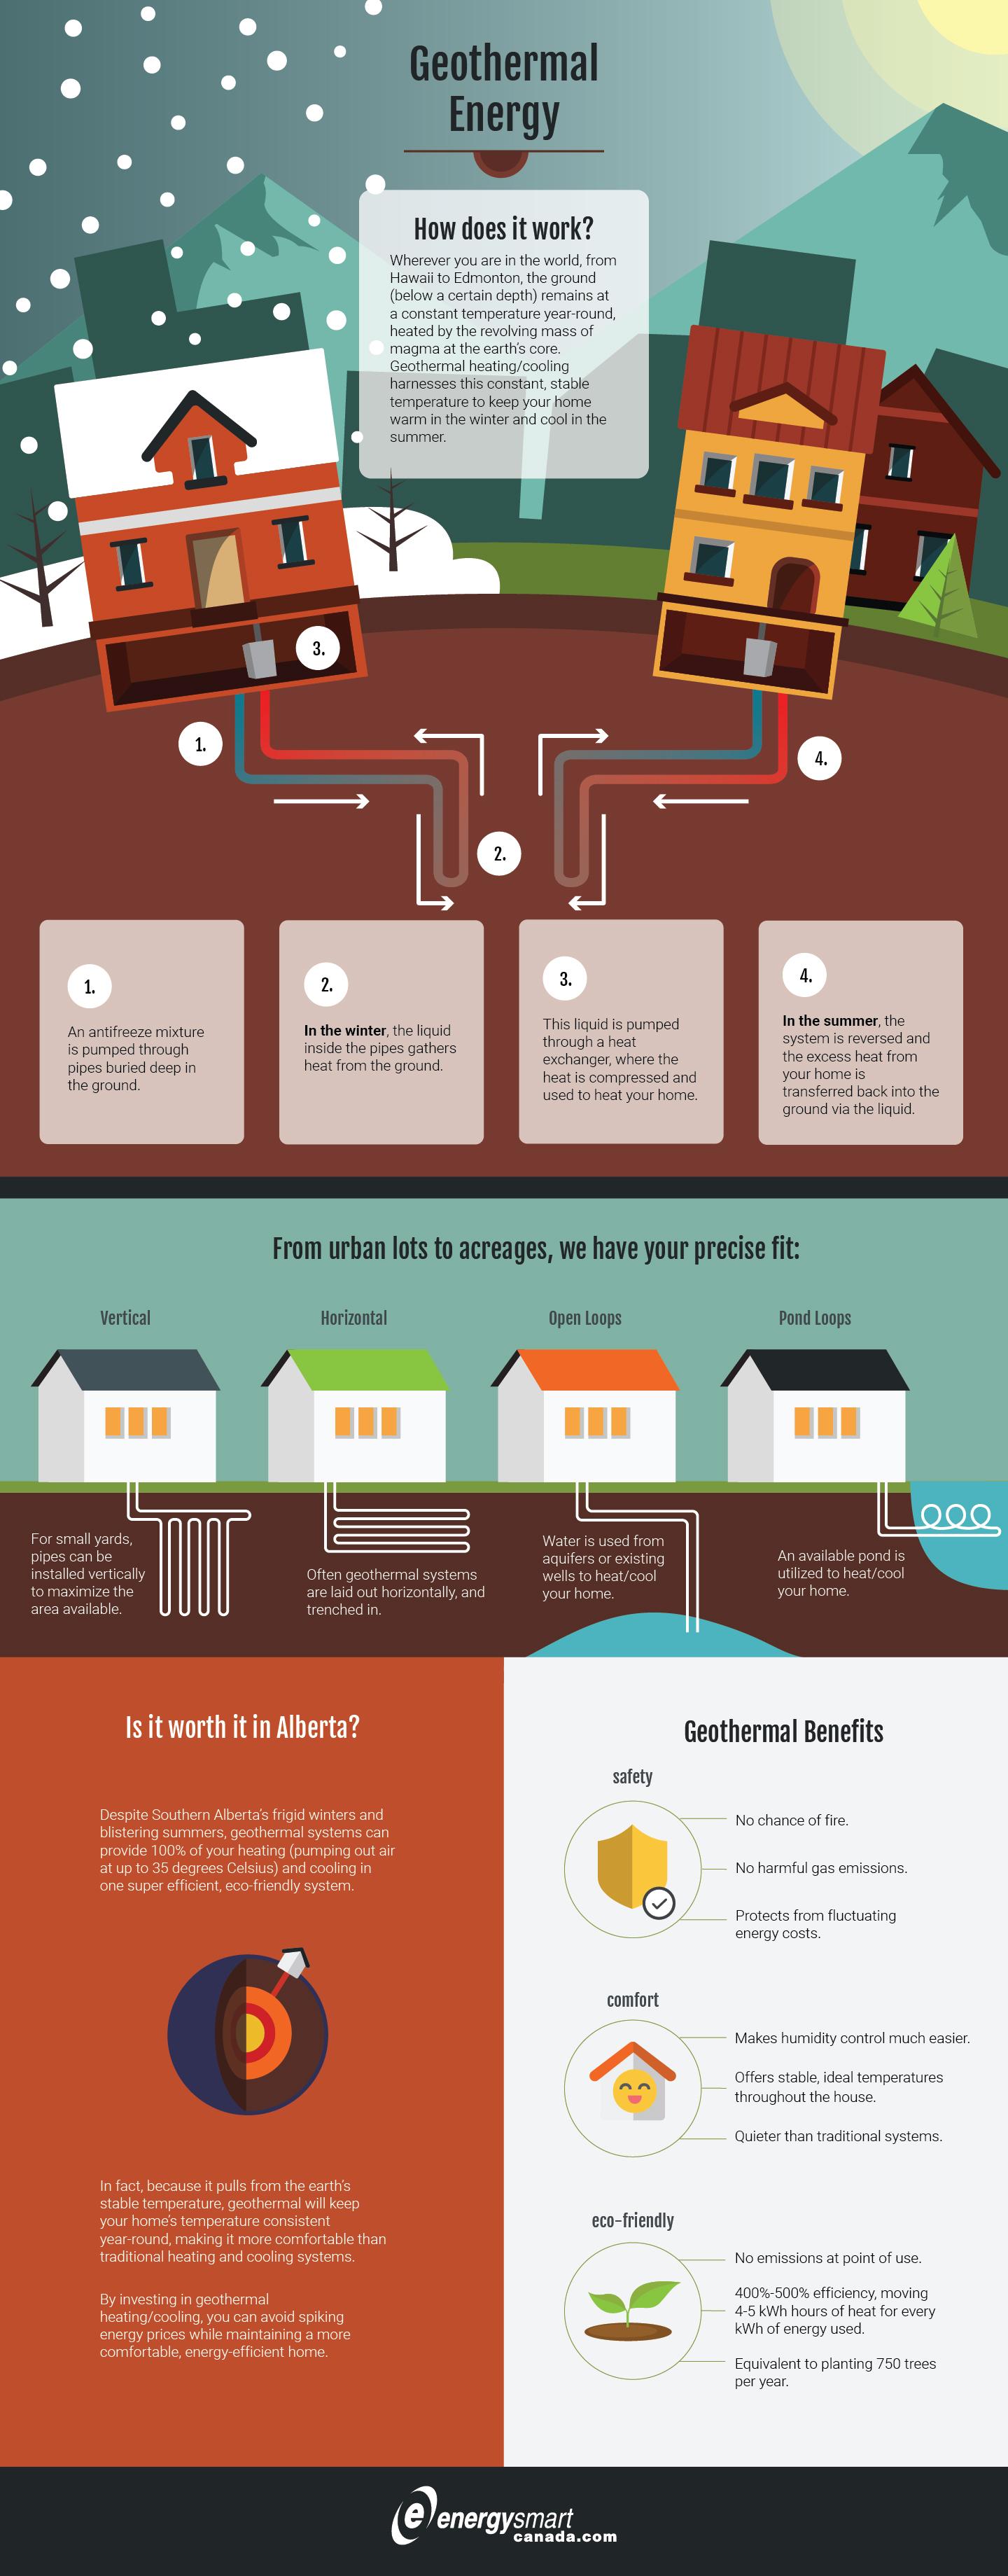 Geothermal Energy How It Works